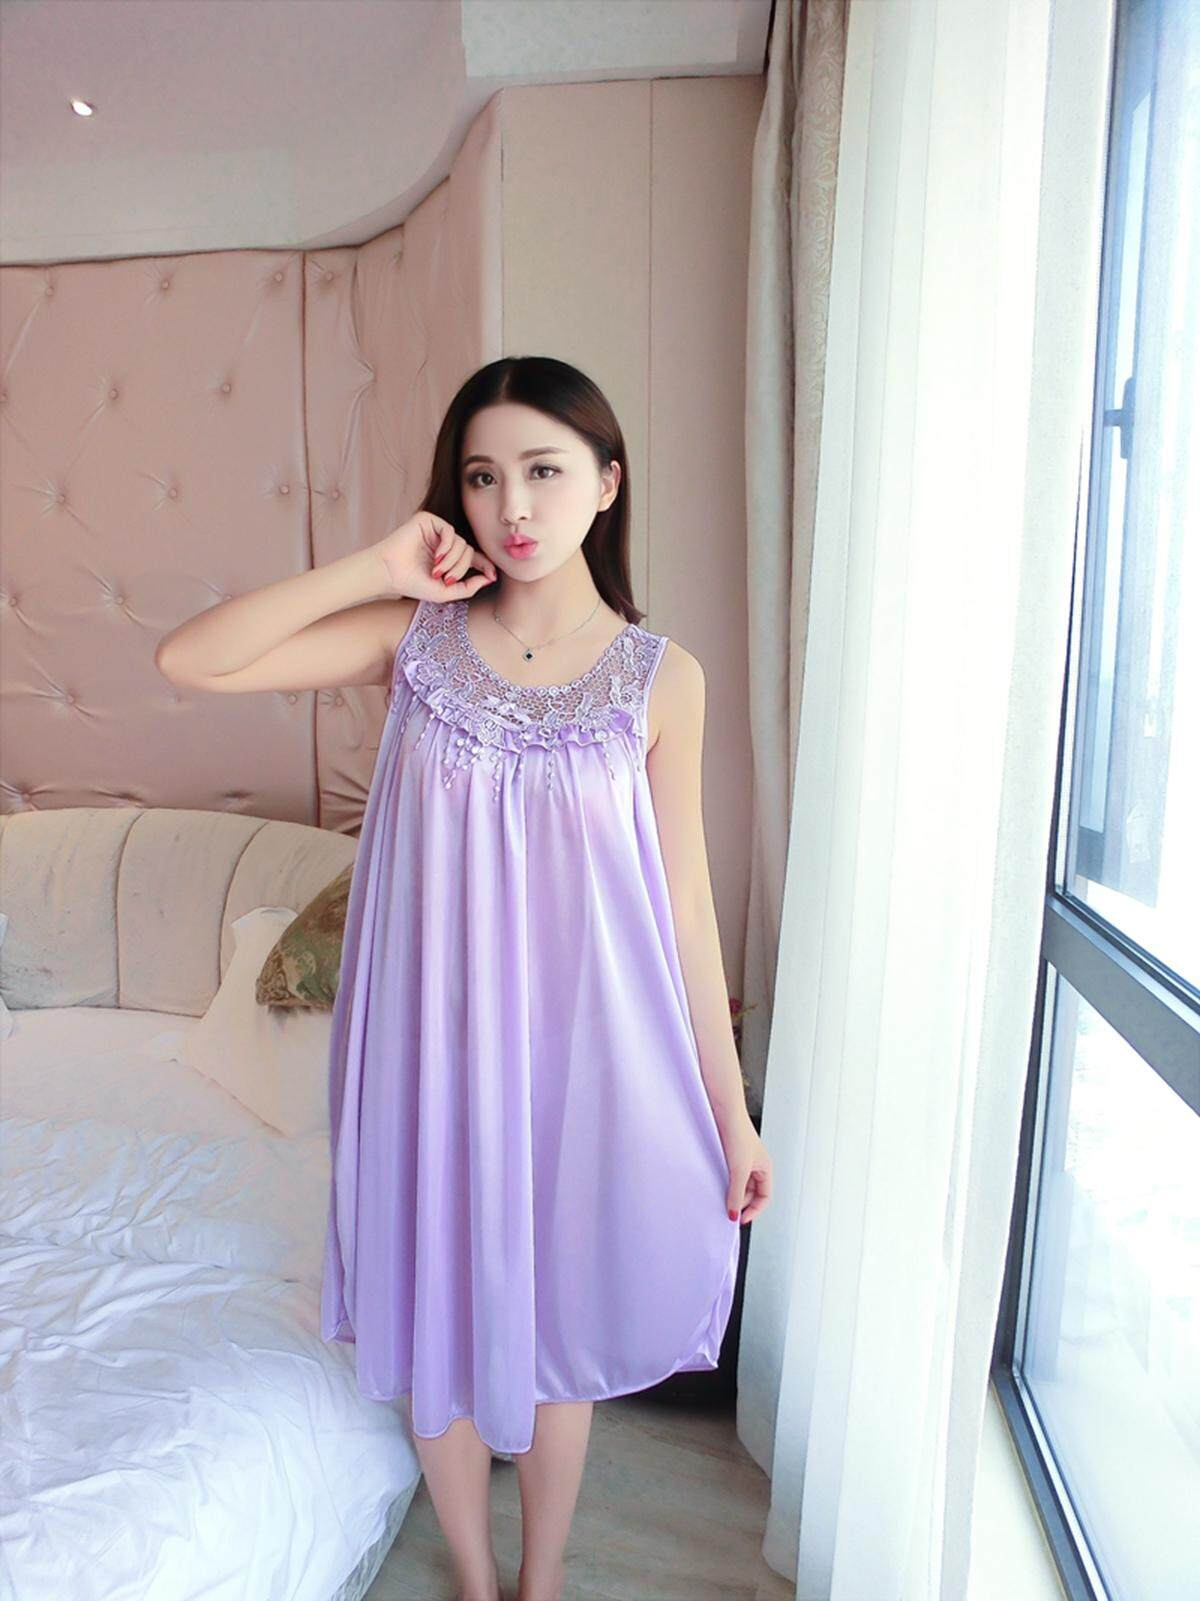 【LIMITED & READY 4 YOU】Brilliant Women Sexy Sleeveless Dress Pyjamas With Premium Grade Quality Silk (Black/Blue/Dark Blue/Lavender Purple/Pink - Free Size)